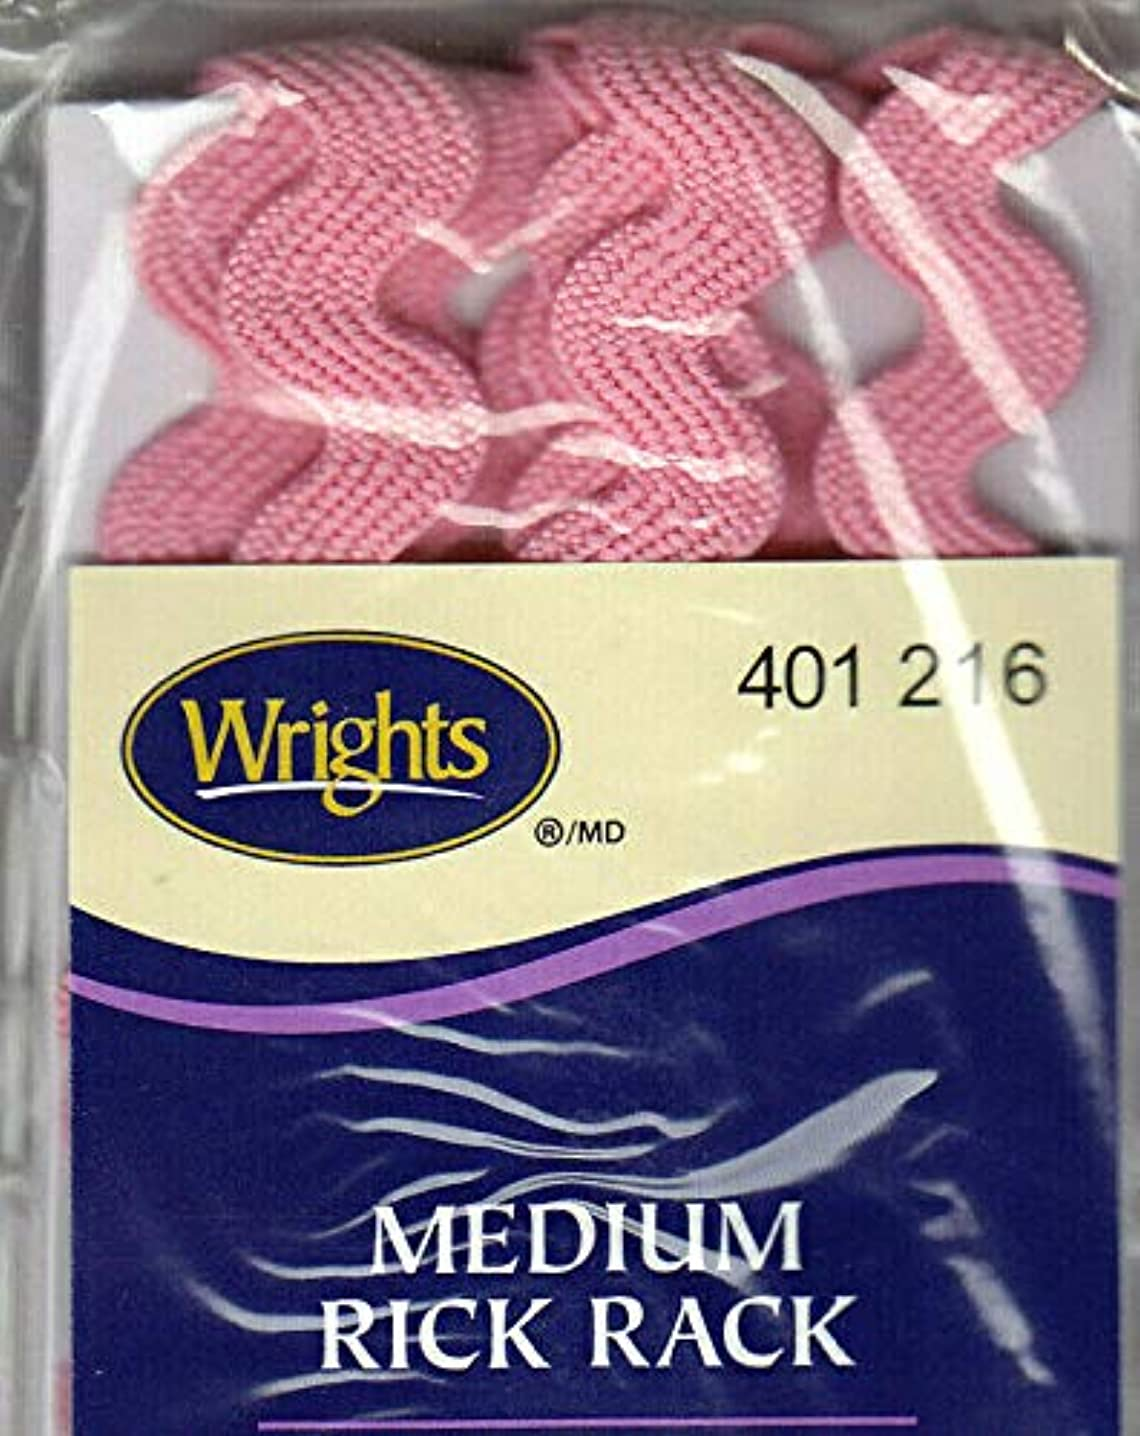 WRIGHTS CANDY PINK (216) MEDIUM RICK RACK - 2 1/2 YARDS (1/2